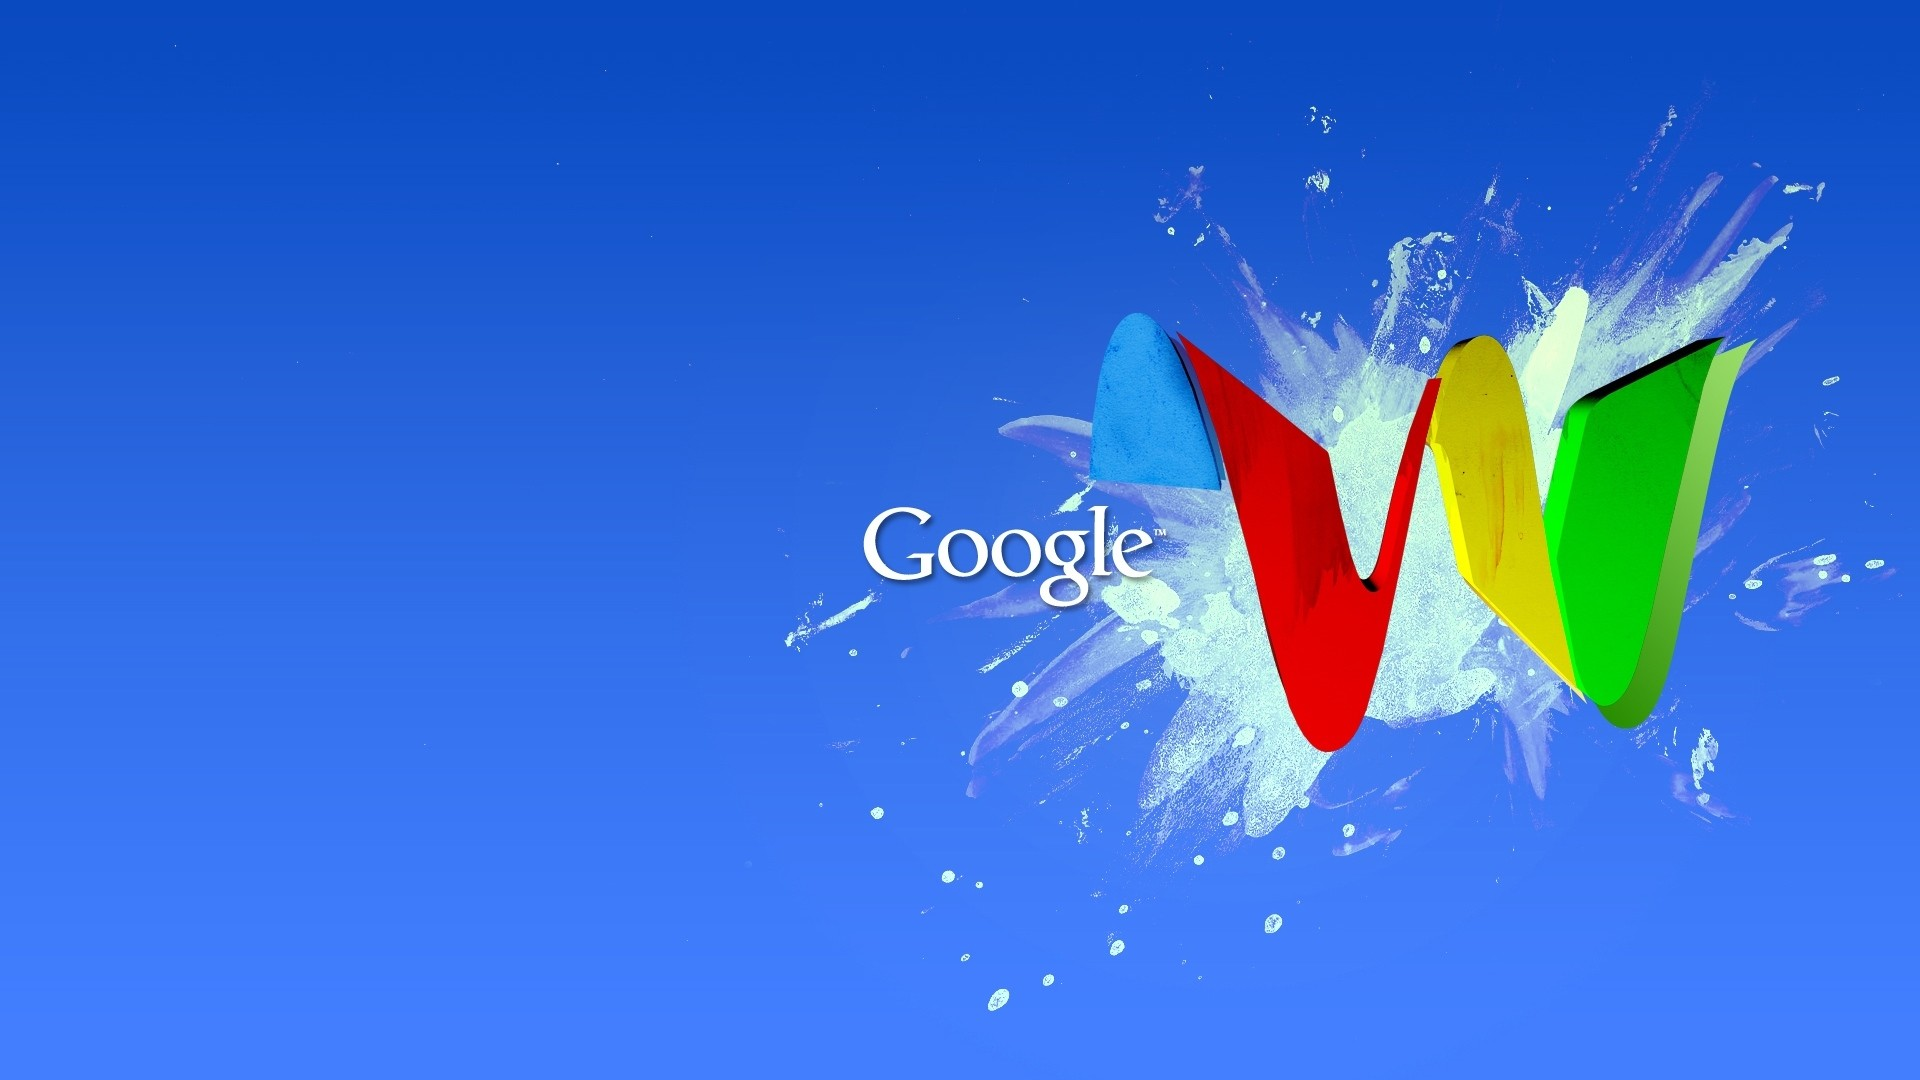 Wallpaper google, blue, red, yellow, green